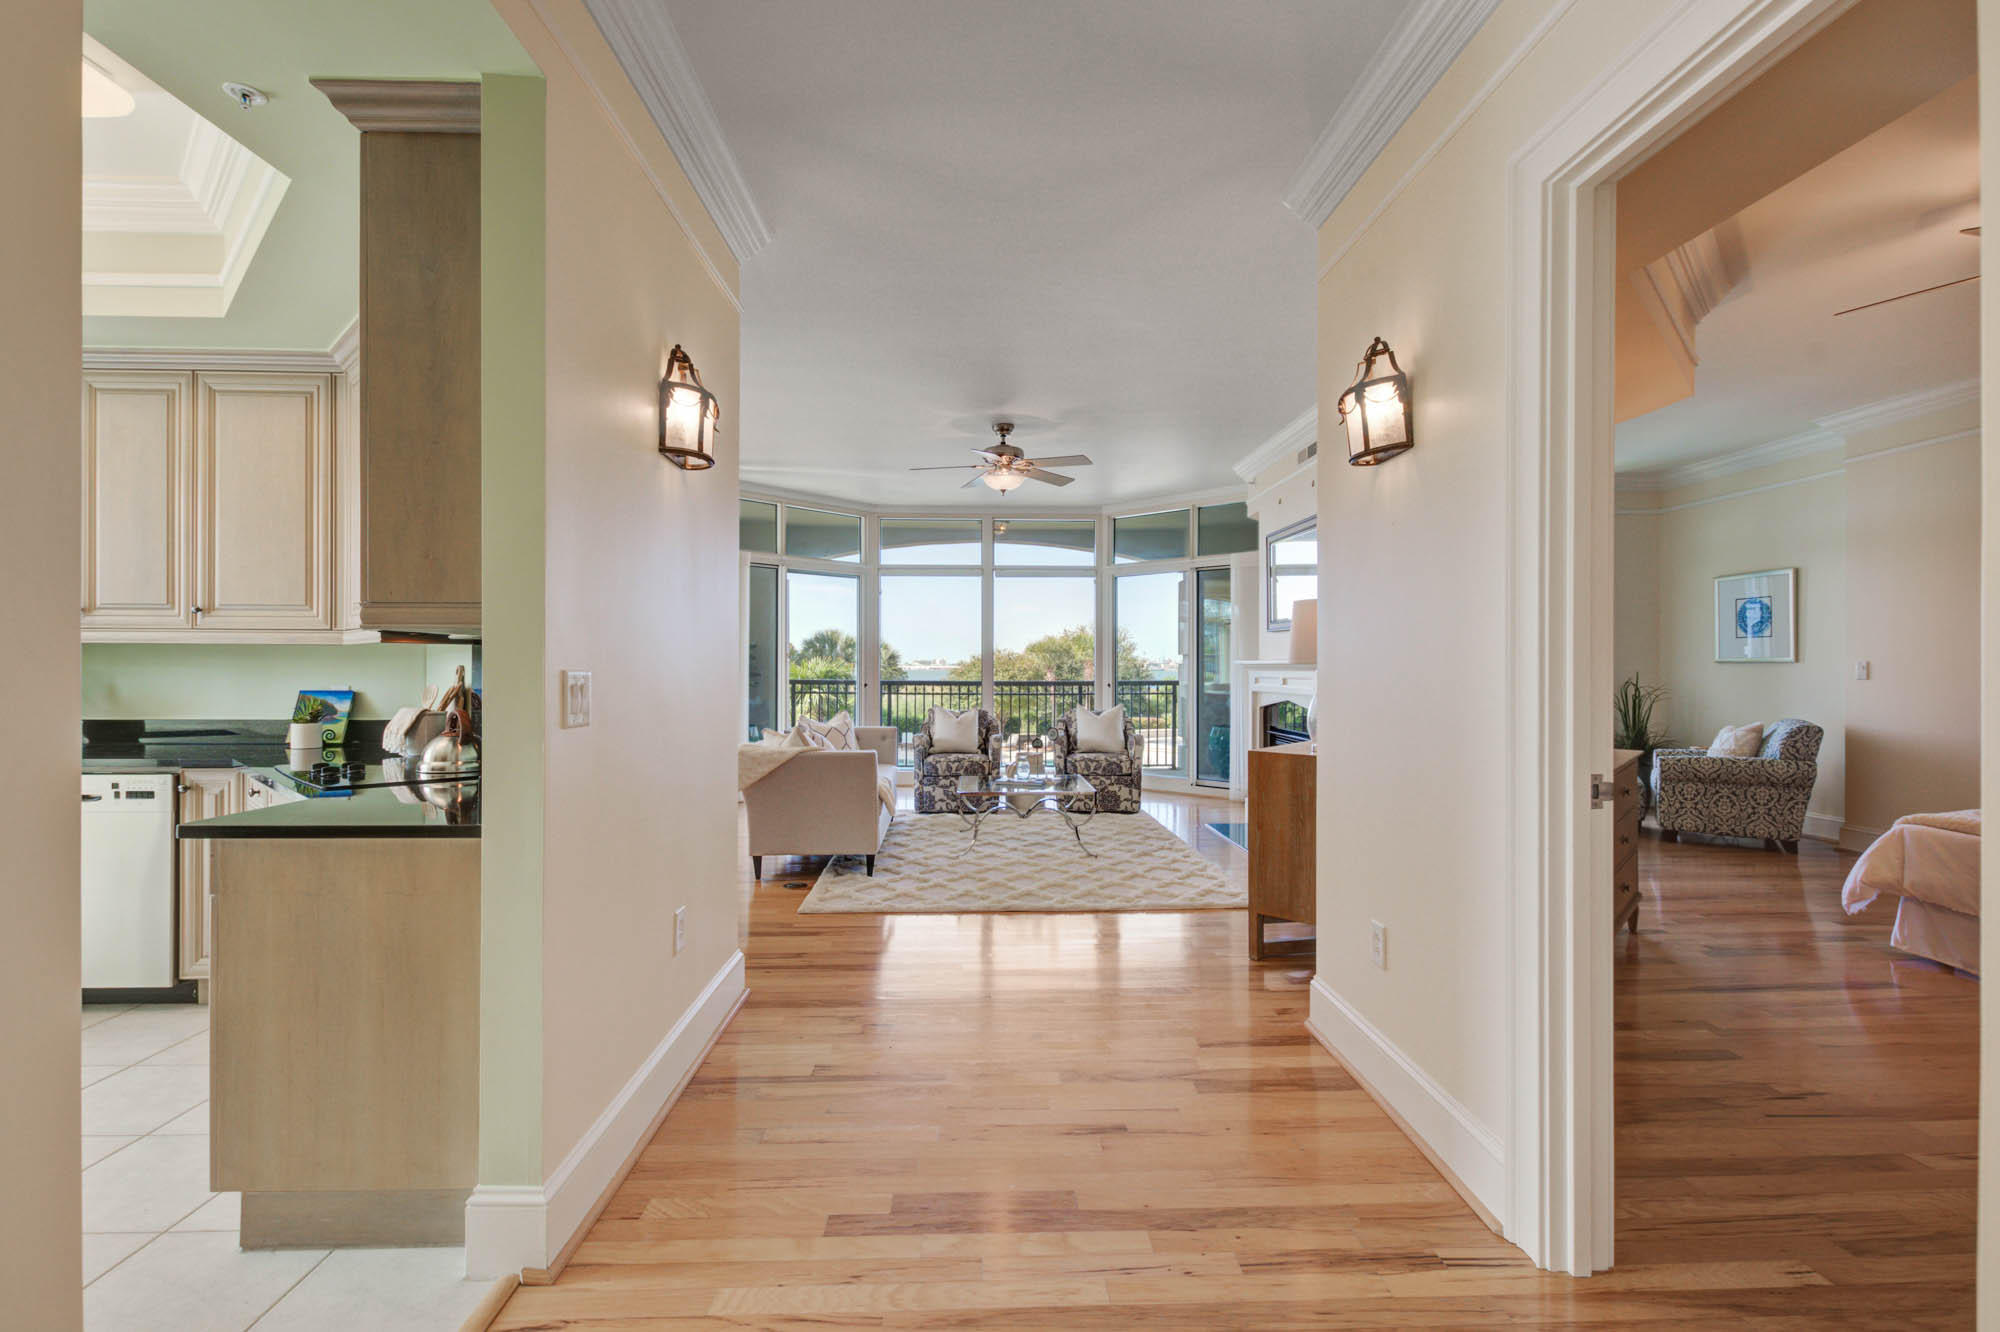 Renaissance On Chas Harbor Homes For Sale - 125 Plaza, Mount Pleasant, SC - 22